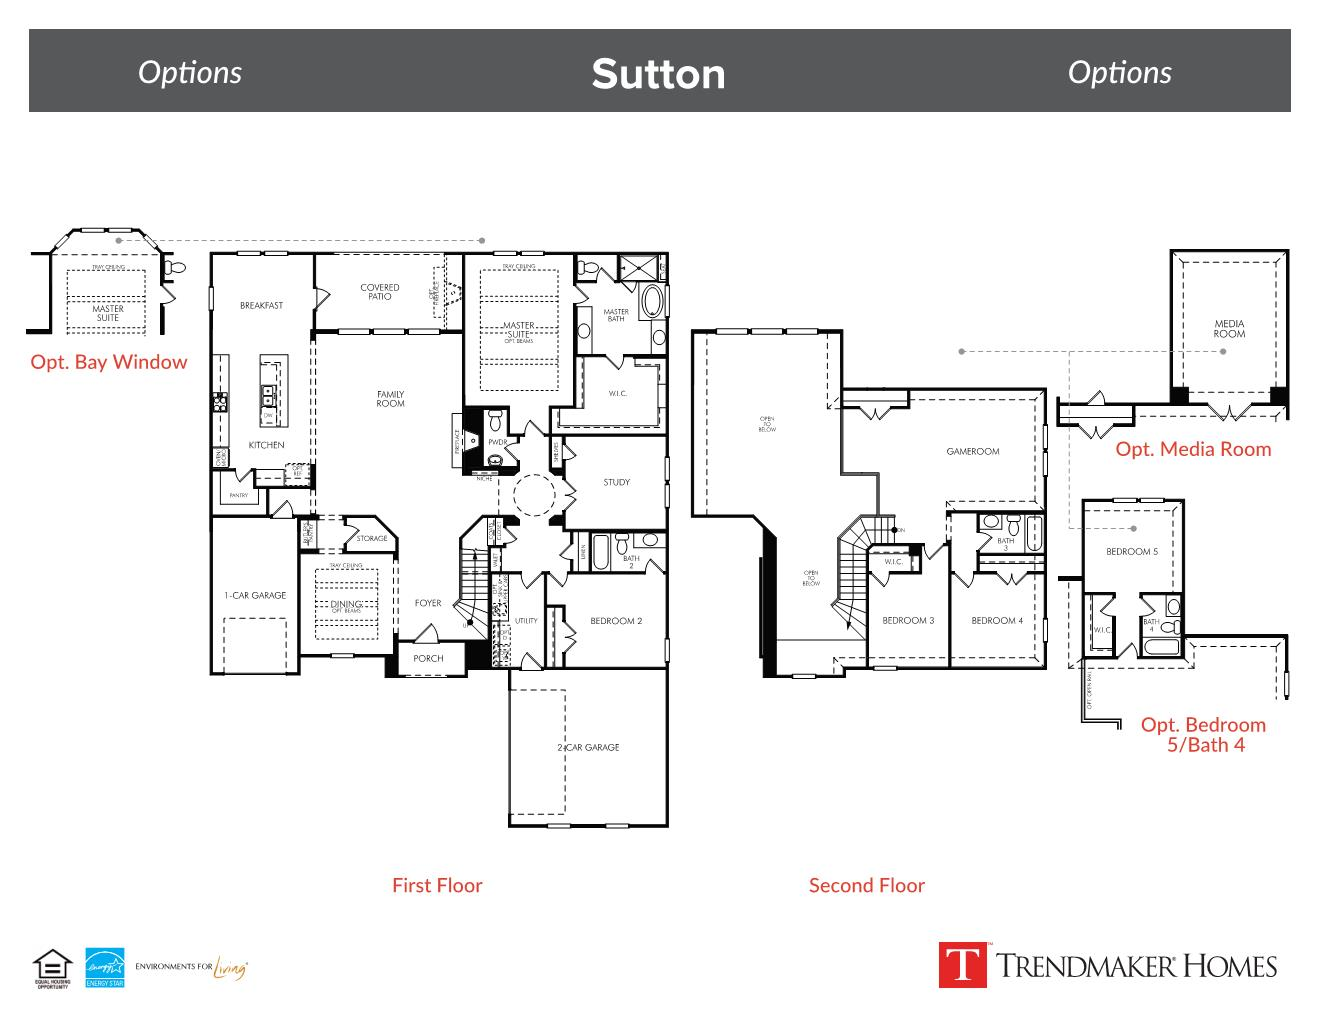 Sutton floor plan - Heath Golf & Yacht Club